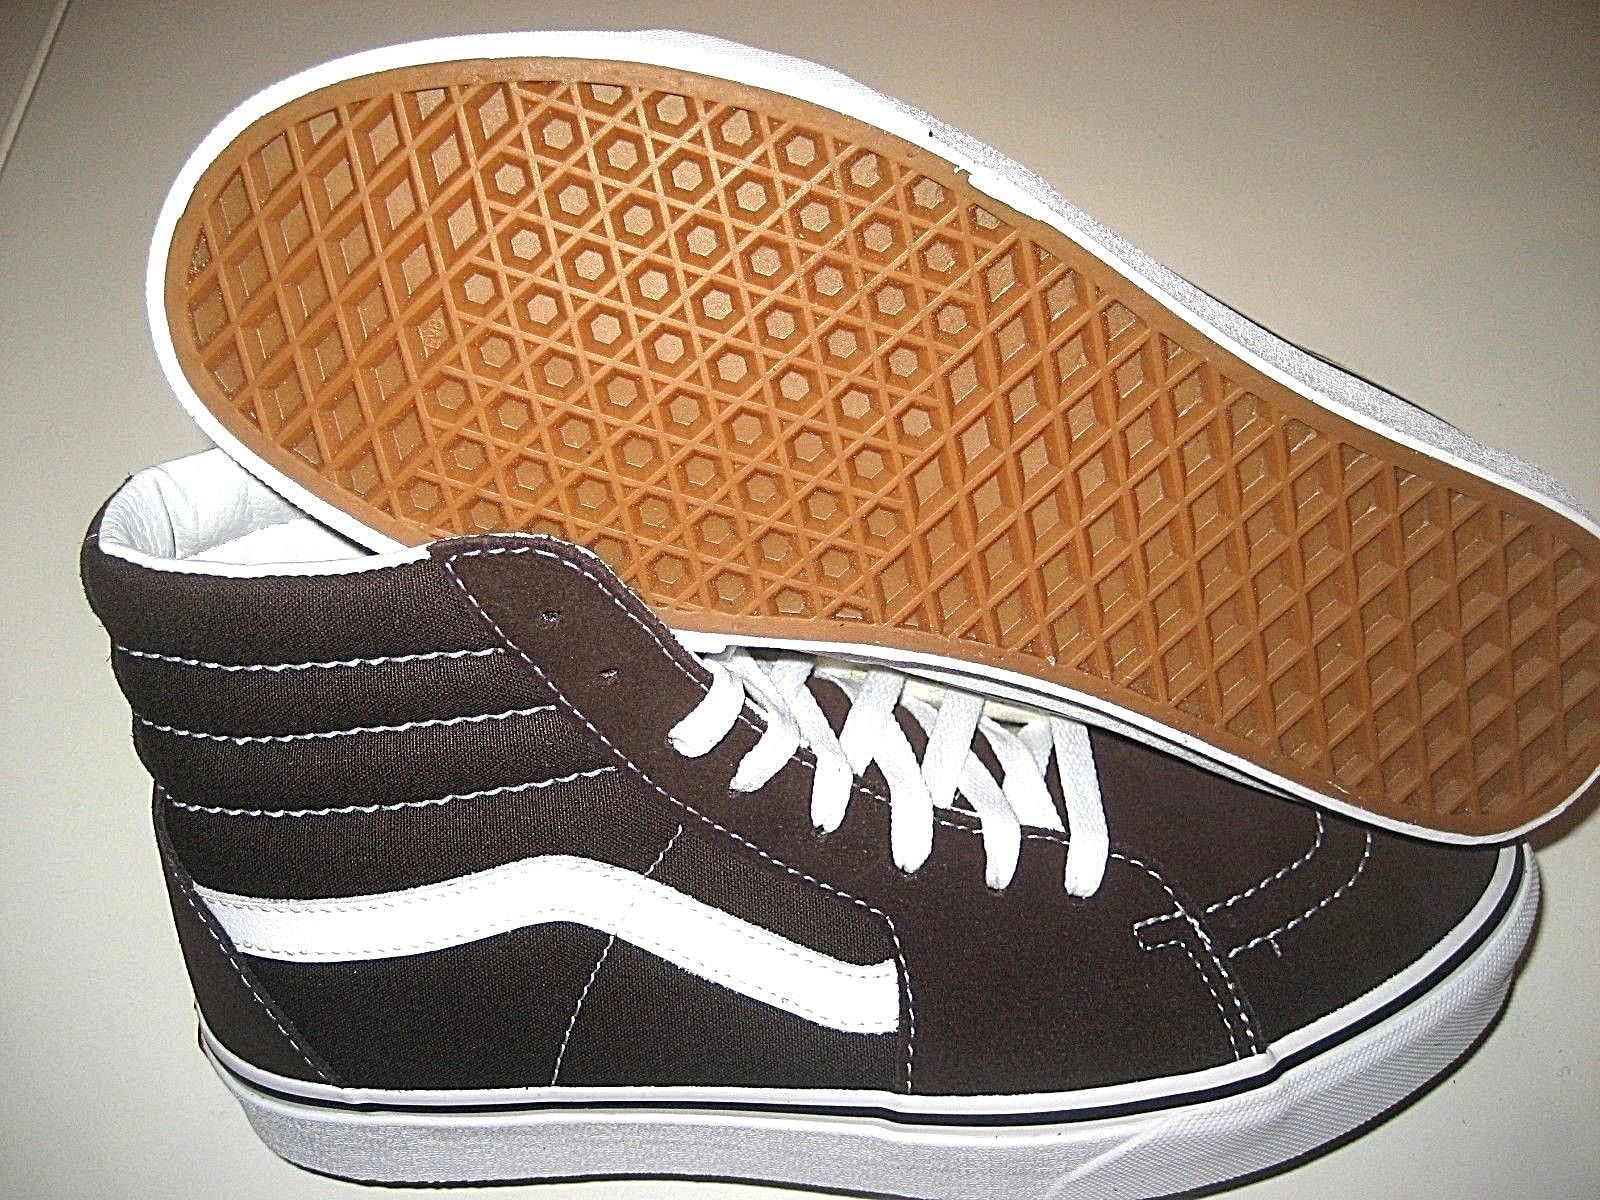 Vans Mens Sk8-Hi Chocolate Torte True White Canvas Suede Skate shoes Size 9 NWT